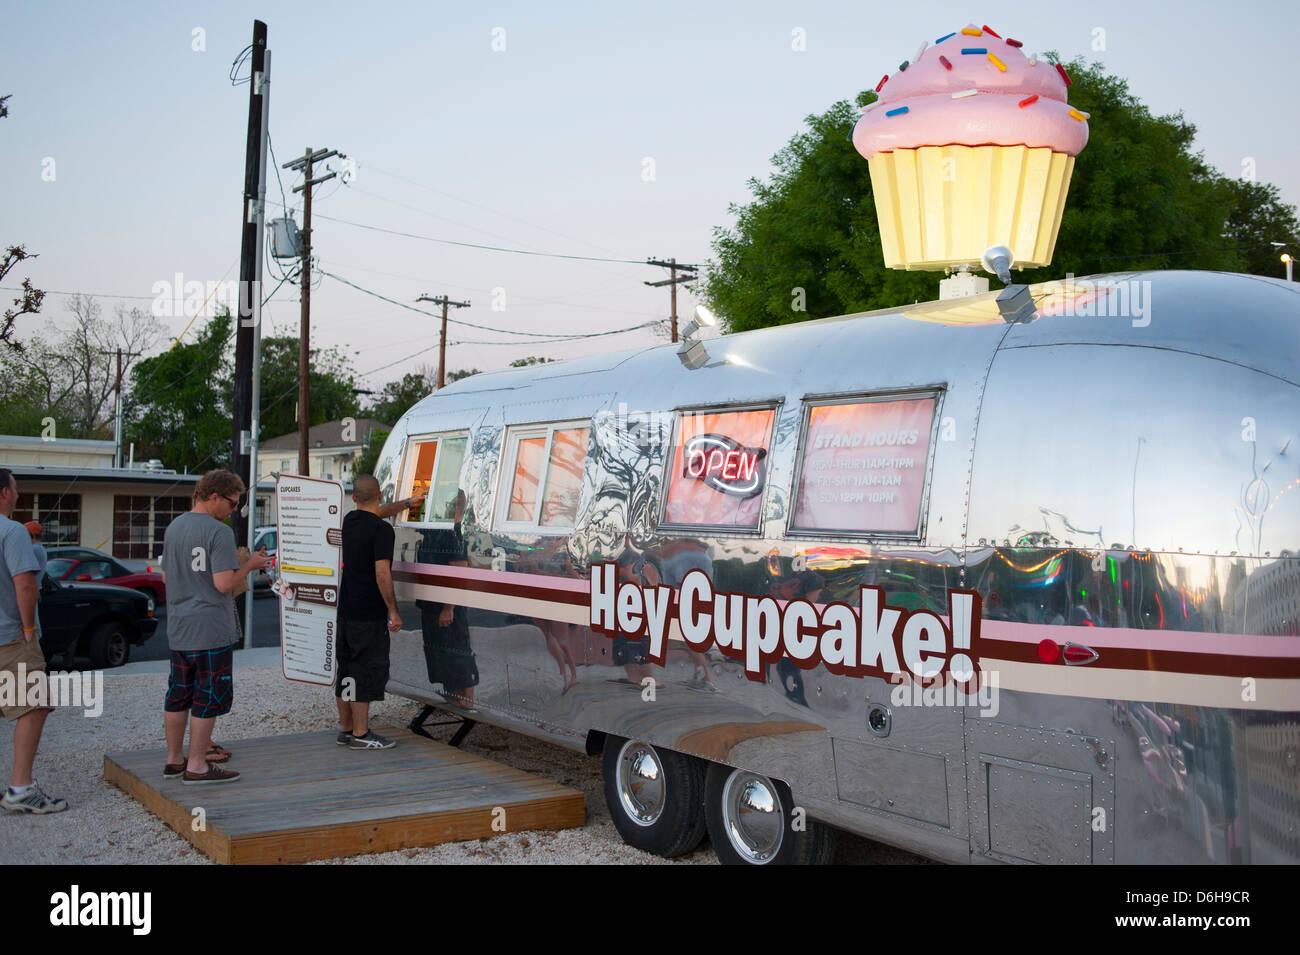 USA Texas TX Austin State Capital Congress Ave South Avenue - Nachtleben Essen Dessert Hey Cupcake Kleinunternehmen Stockbild